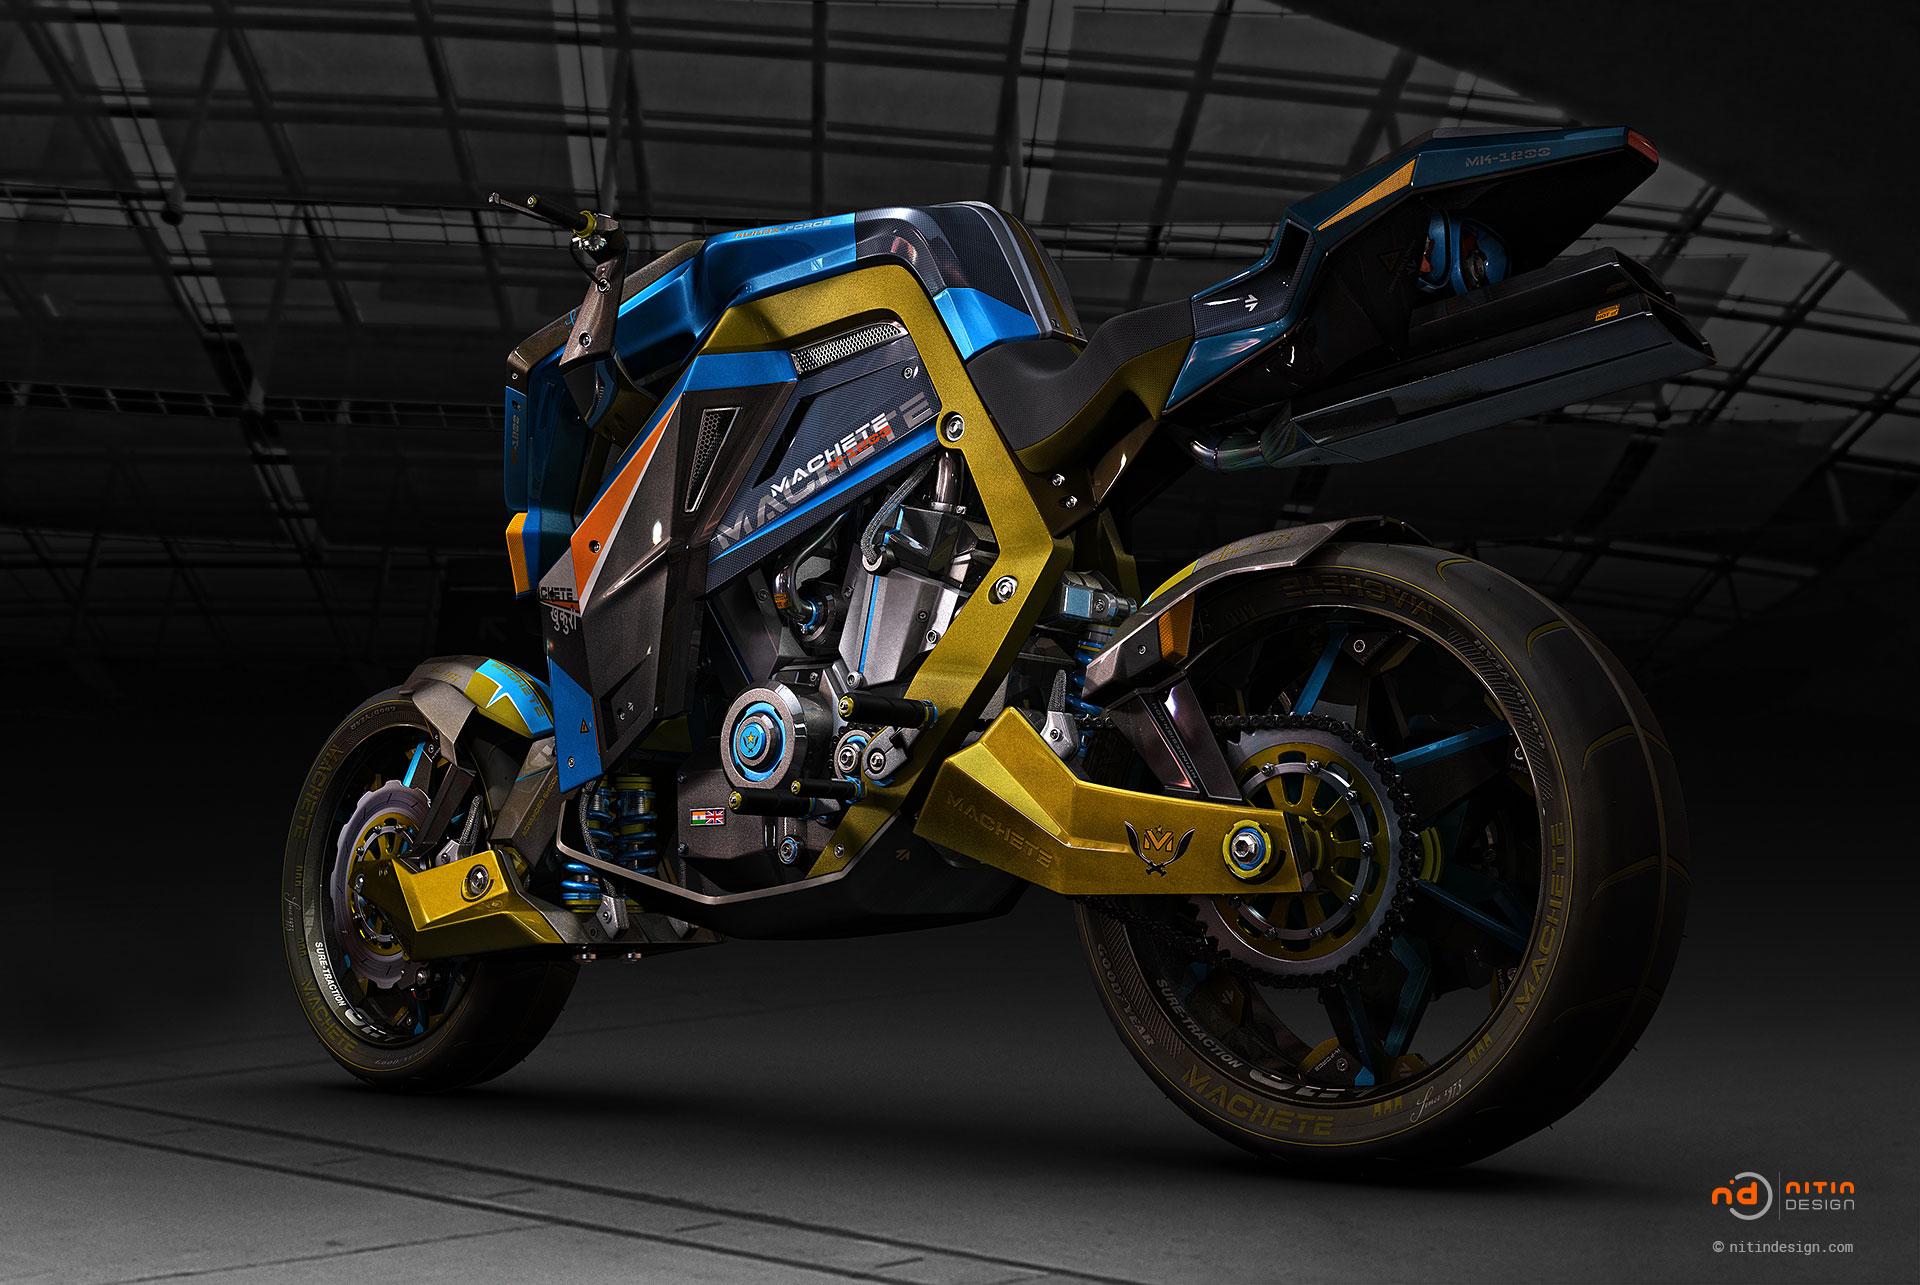 Machete-Motorbike-Nitin-Design-